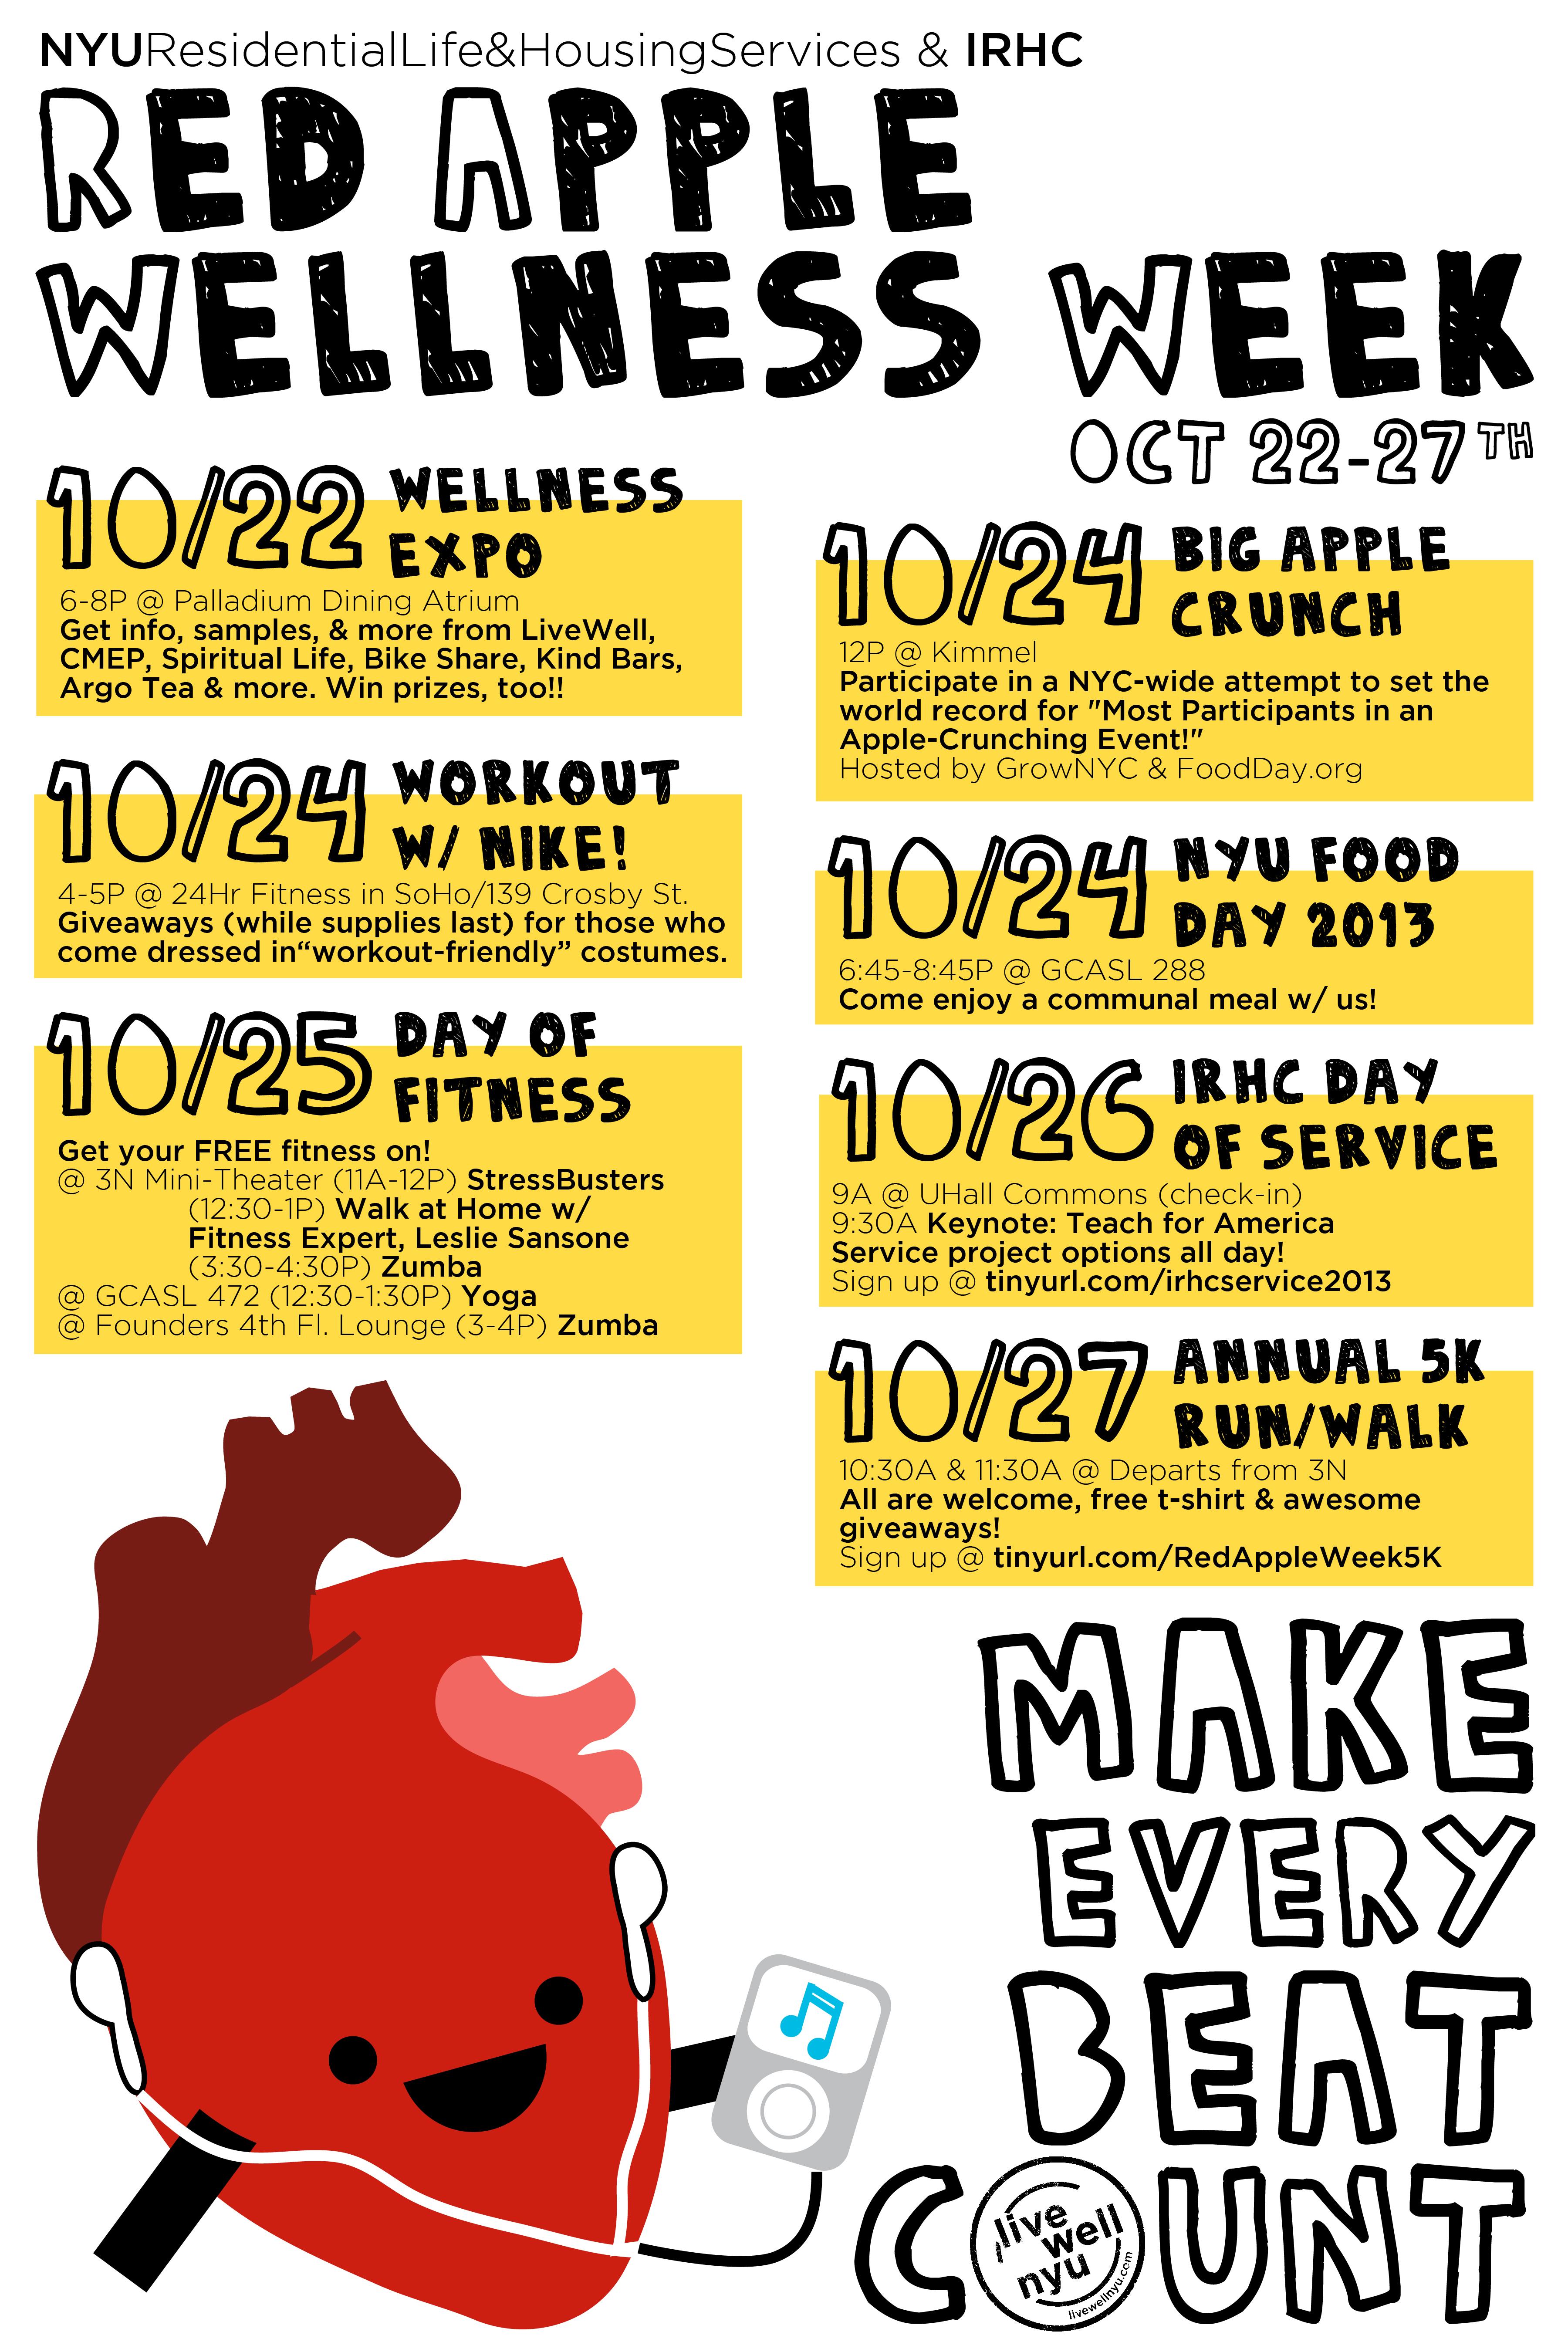 Red Apple Wellness Week Nyu Founders Hall